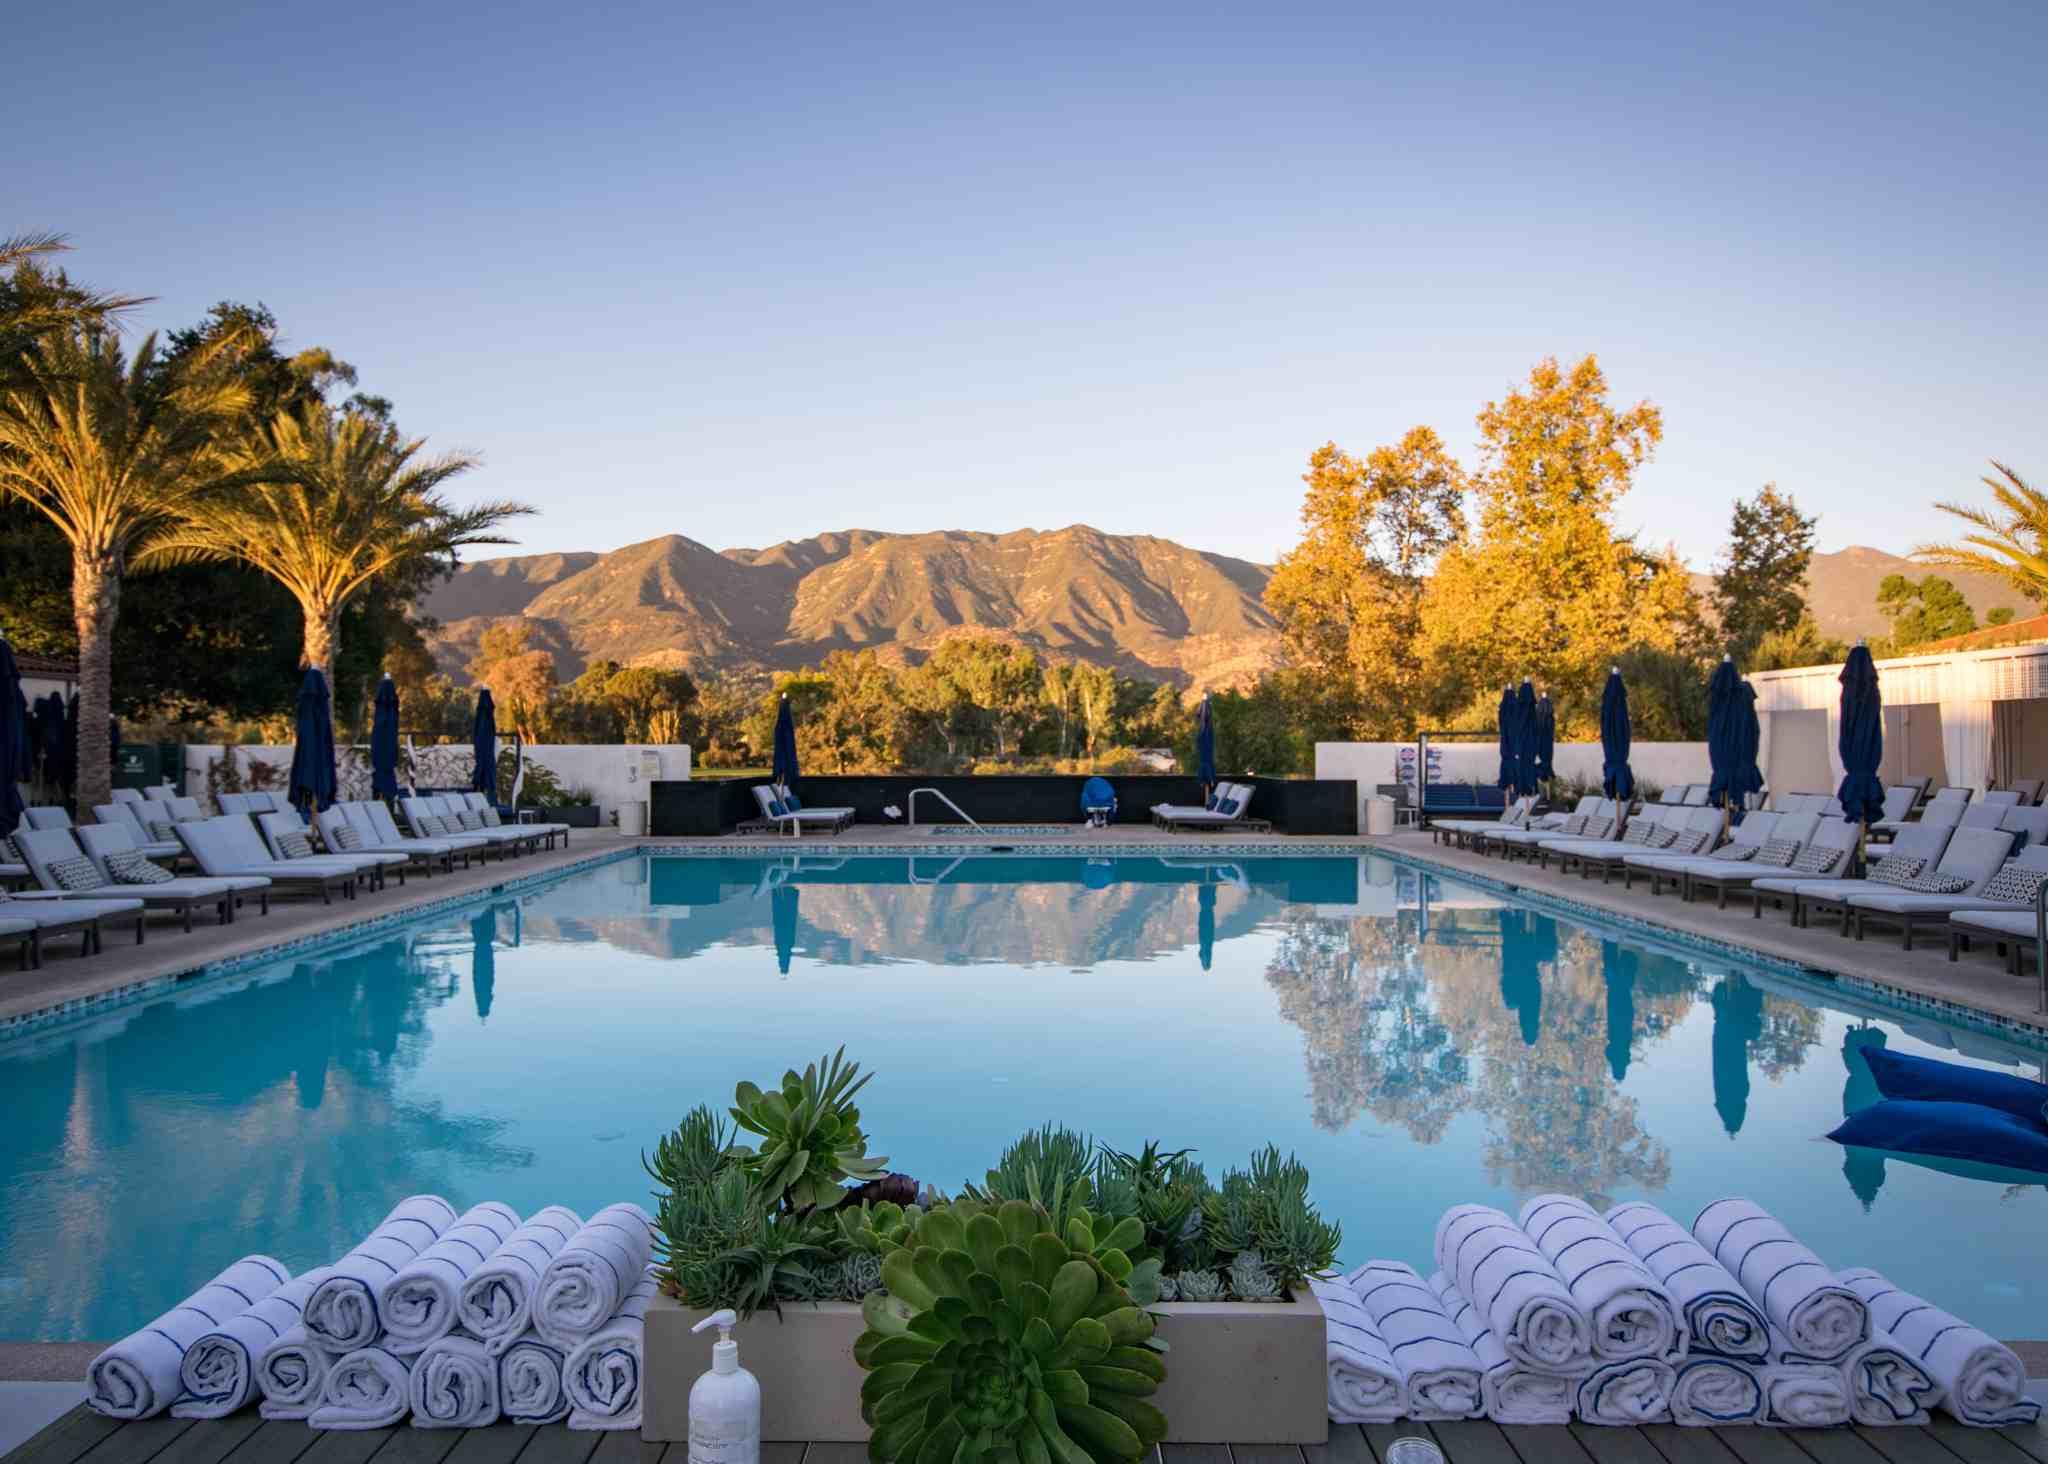 Luxury Hotels Ojai Valley Inn Spa: The Magical Spas Of Ojai Near Los Angeles